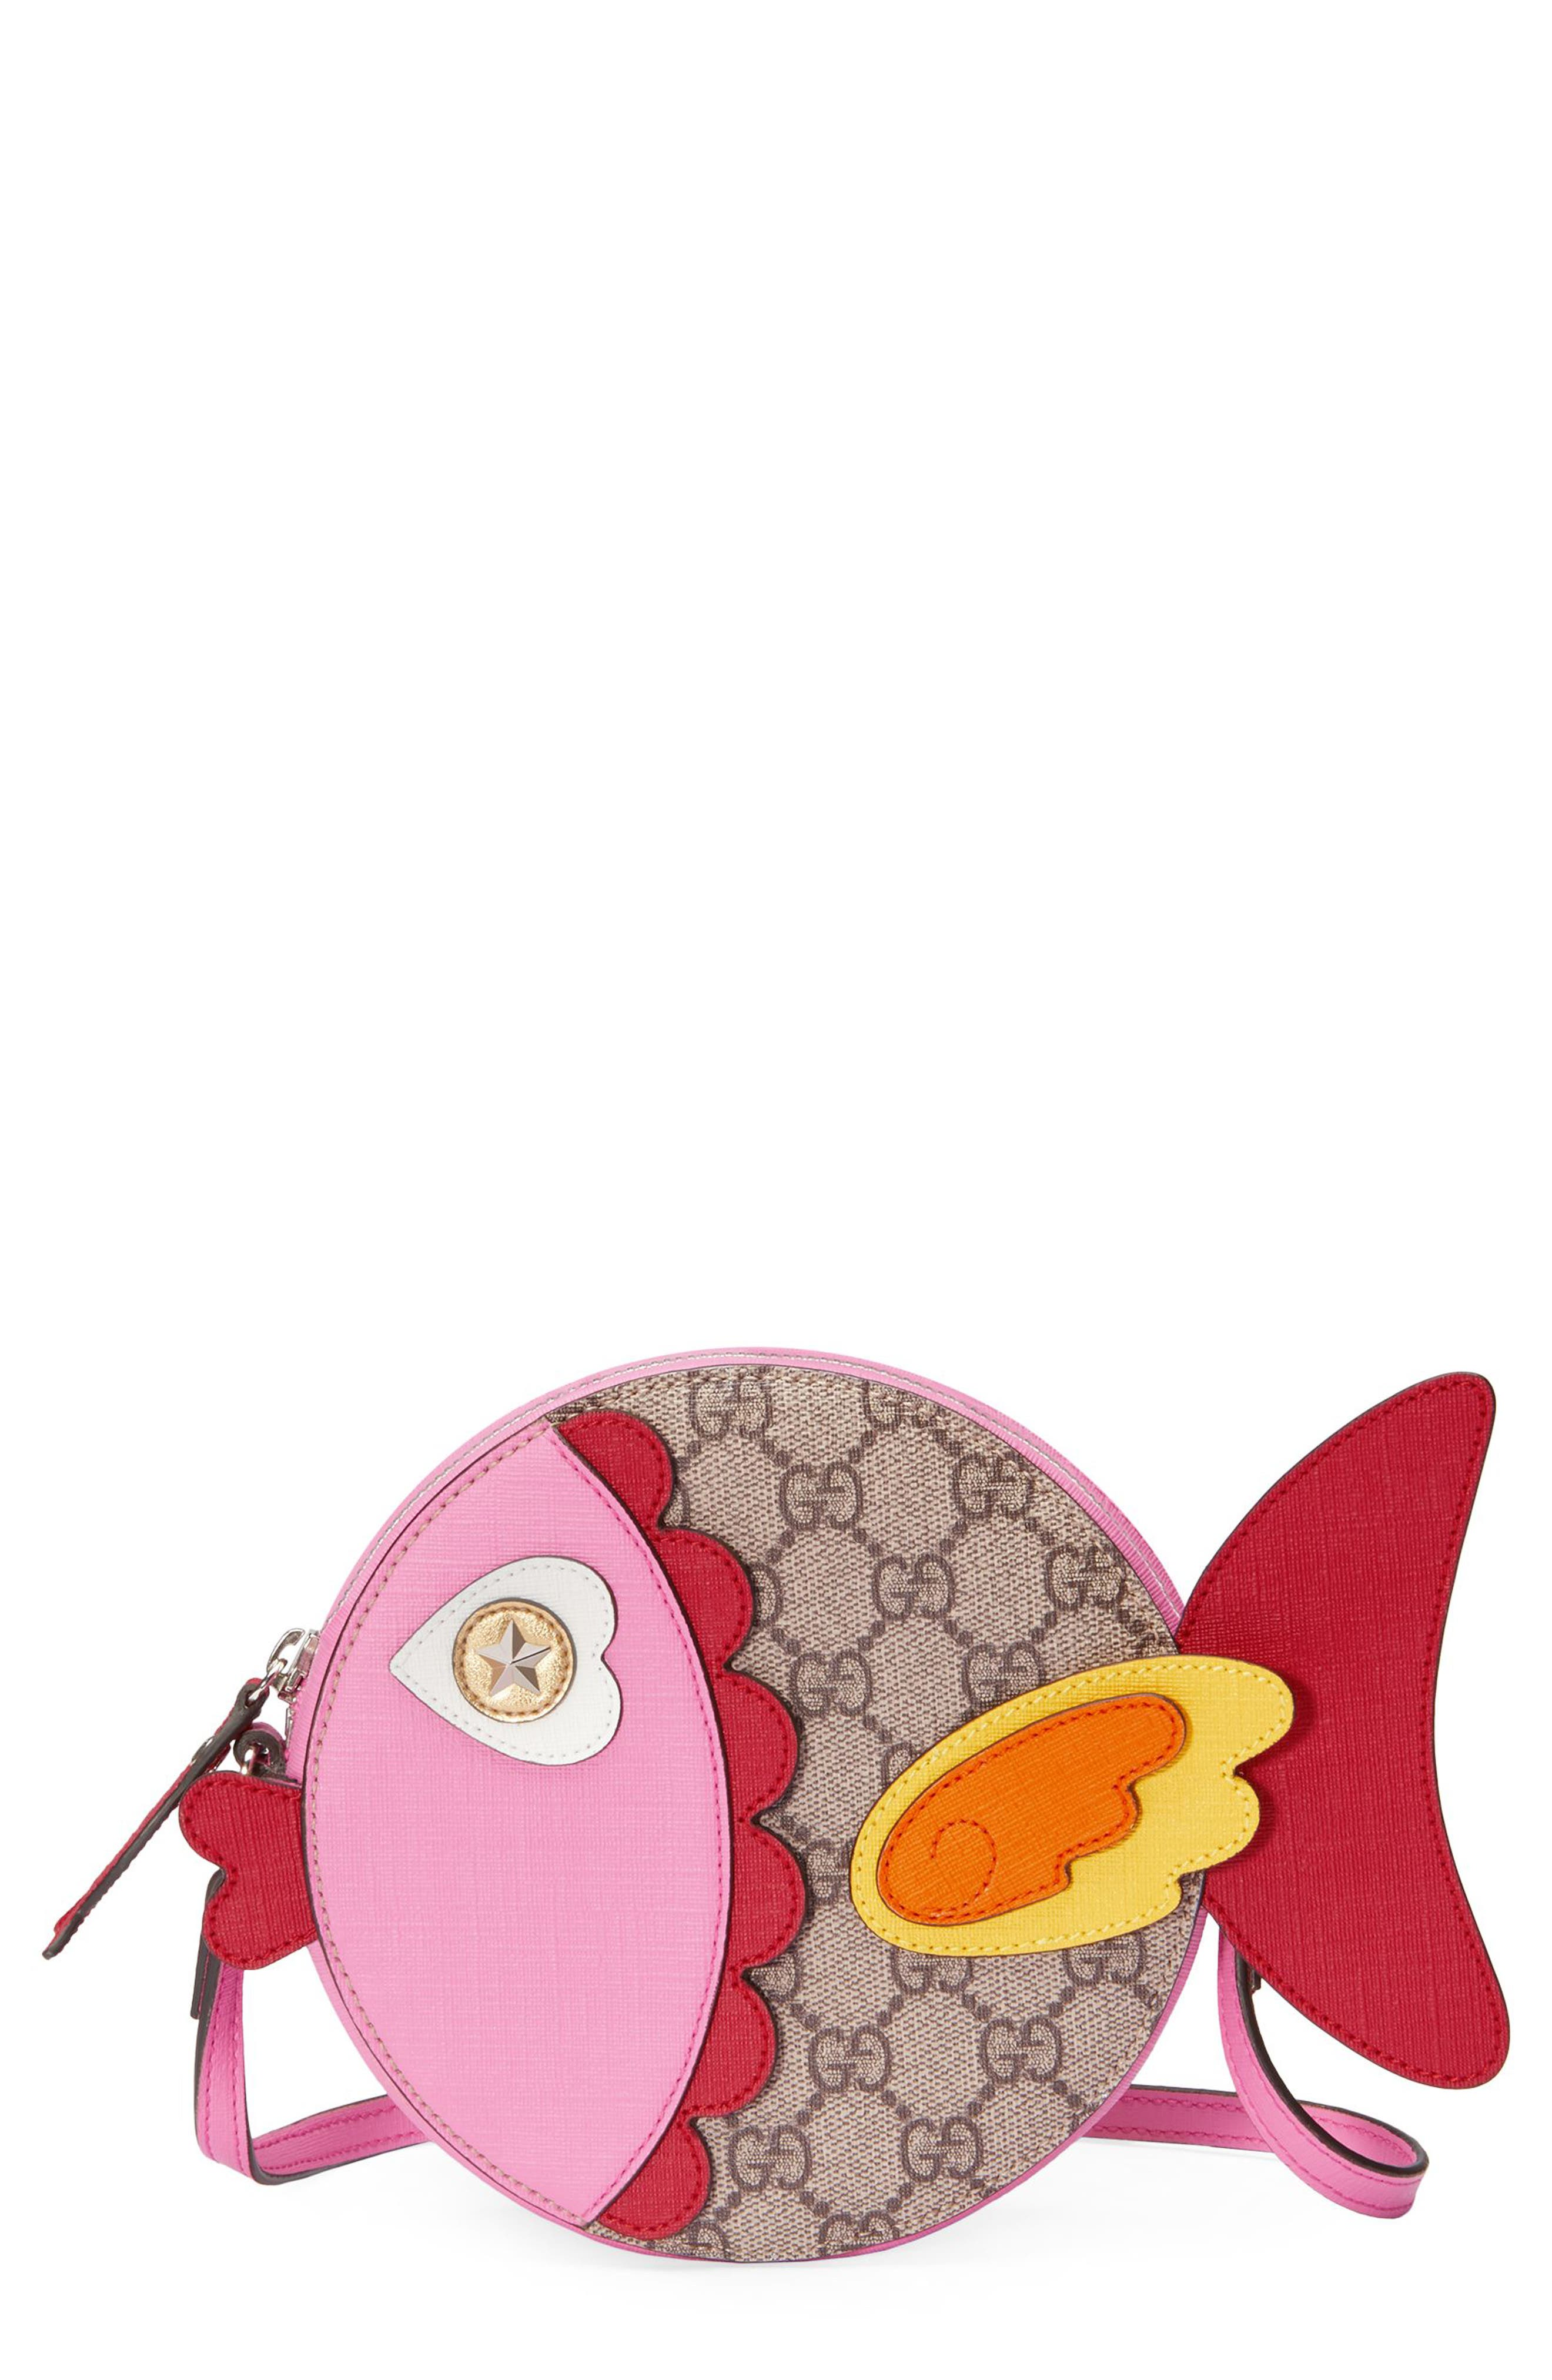 Gucci GG Supreme Fish Canvas Shoulder Bag,                             Main thumbnail 1, color,                             204